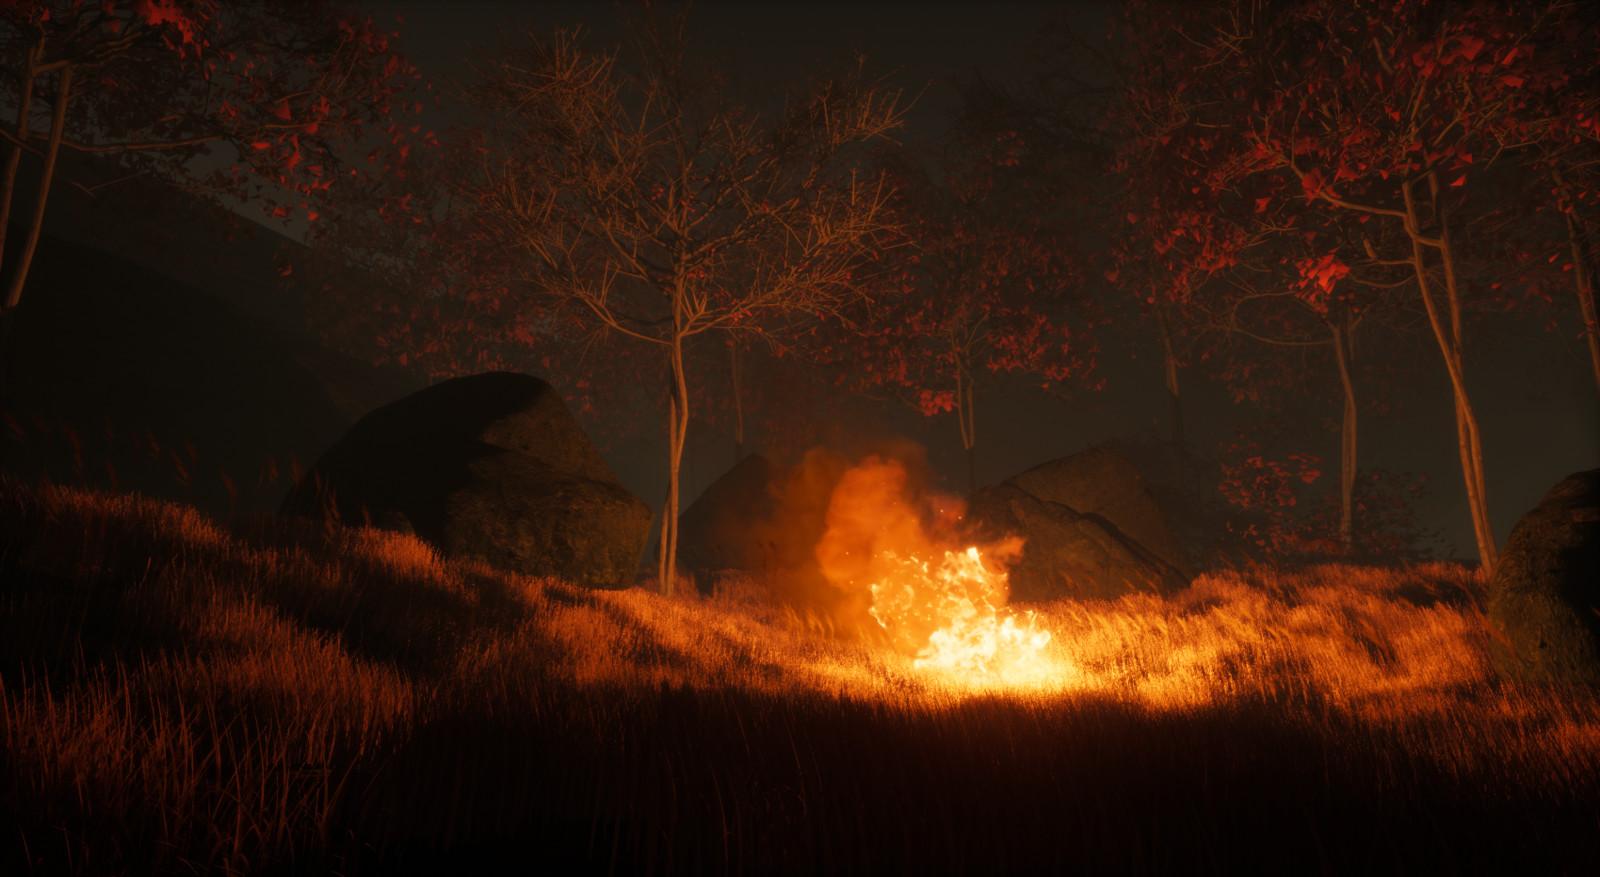 No tent and rocks around fire -Progress shot